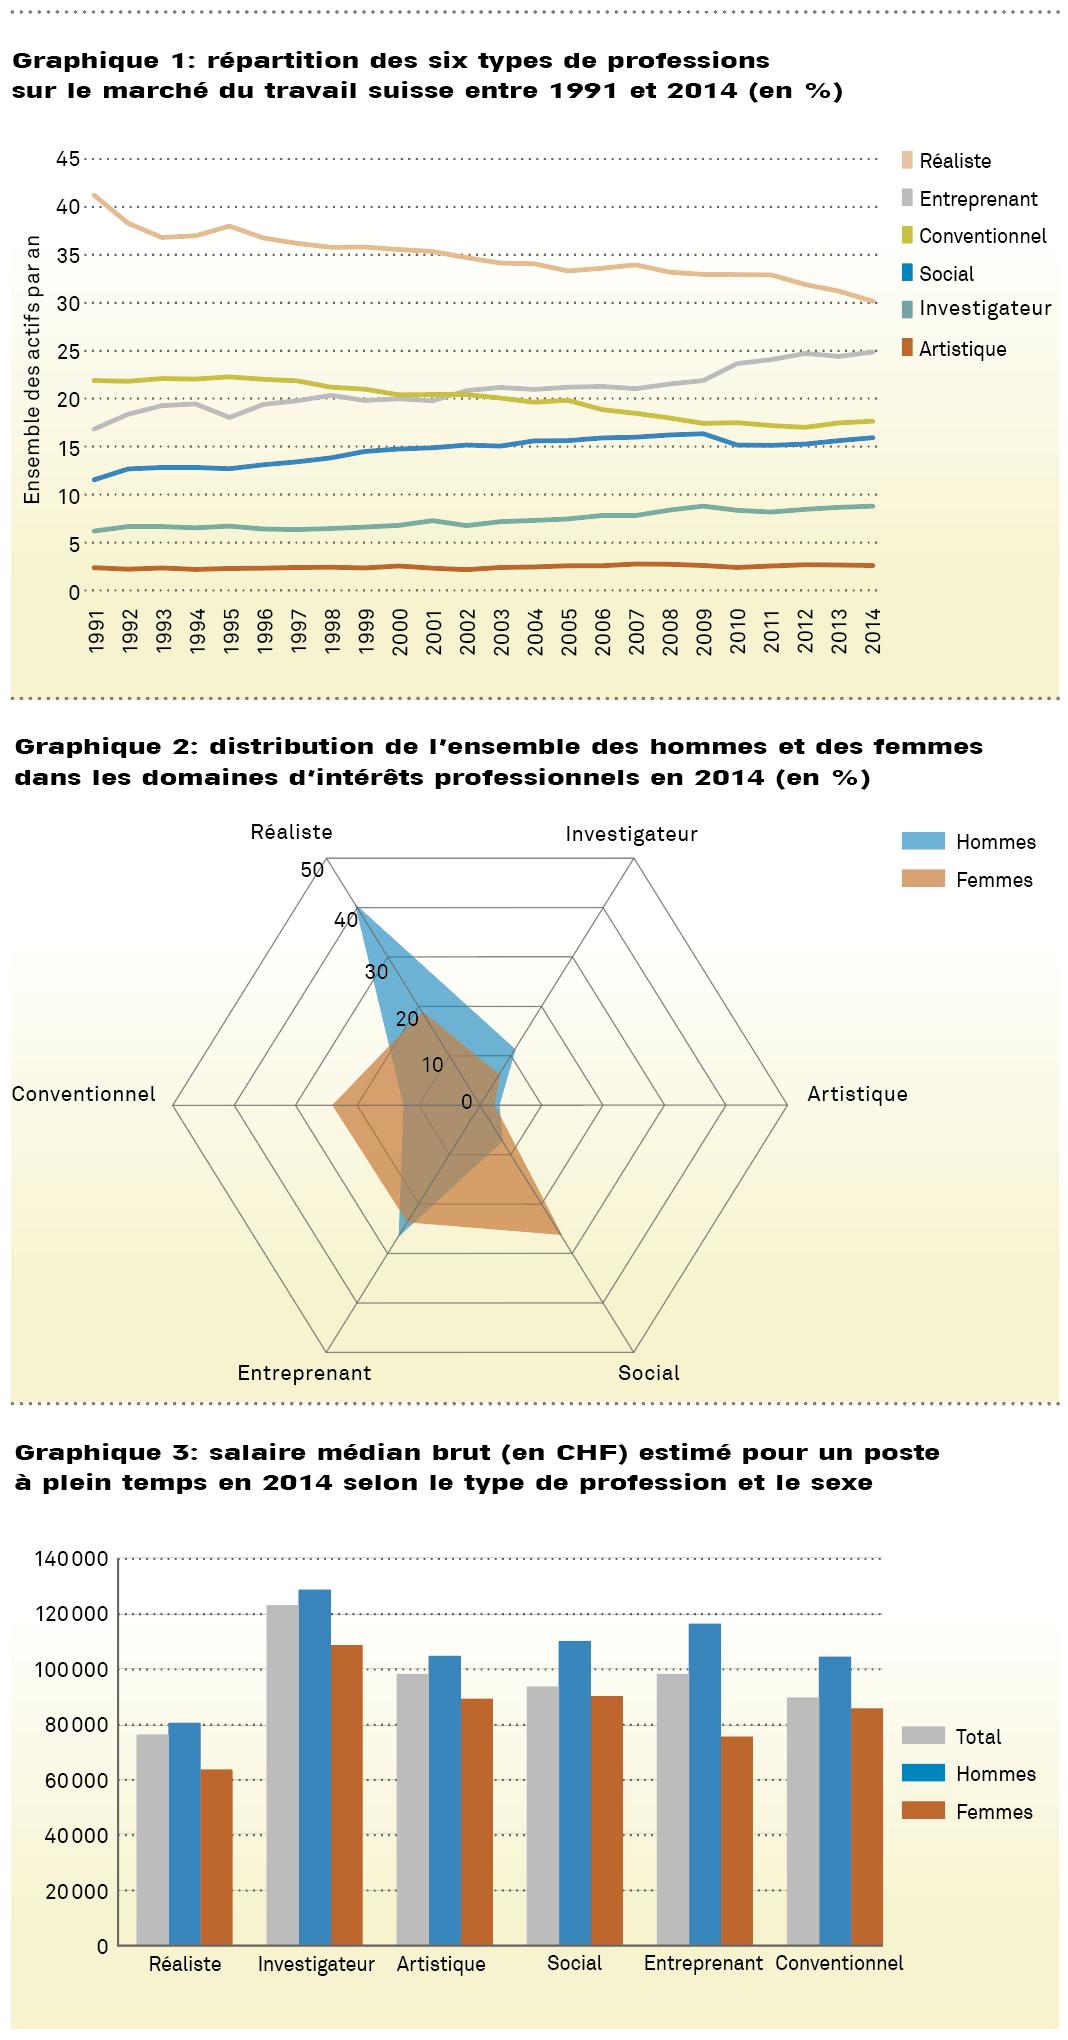 Source: Ghetta, A. et al. (2018)